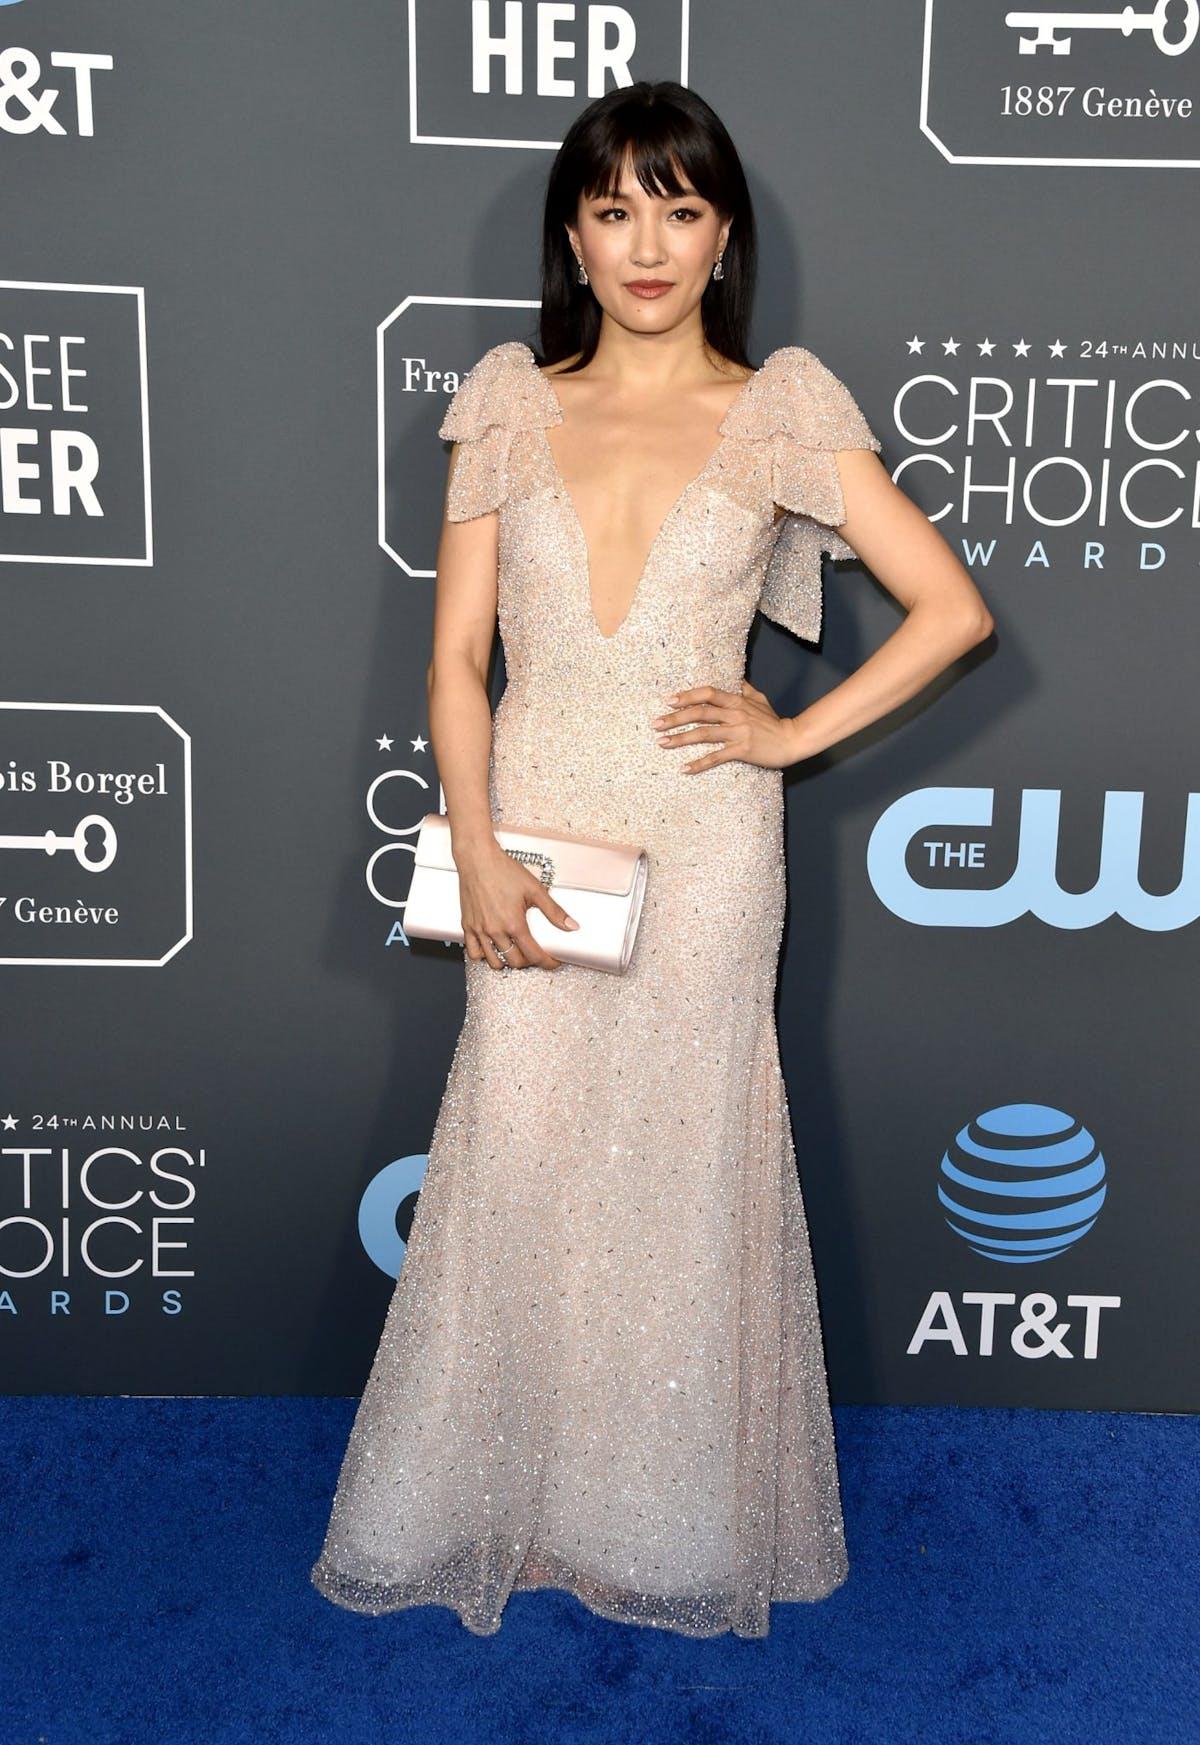 Critics Choice Awards 2019 The Best Red Carpet Looks